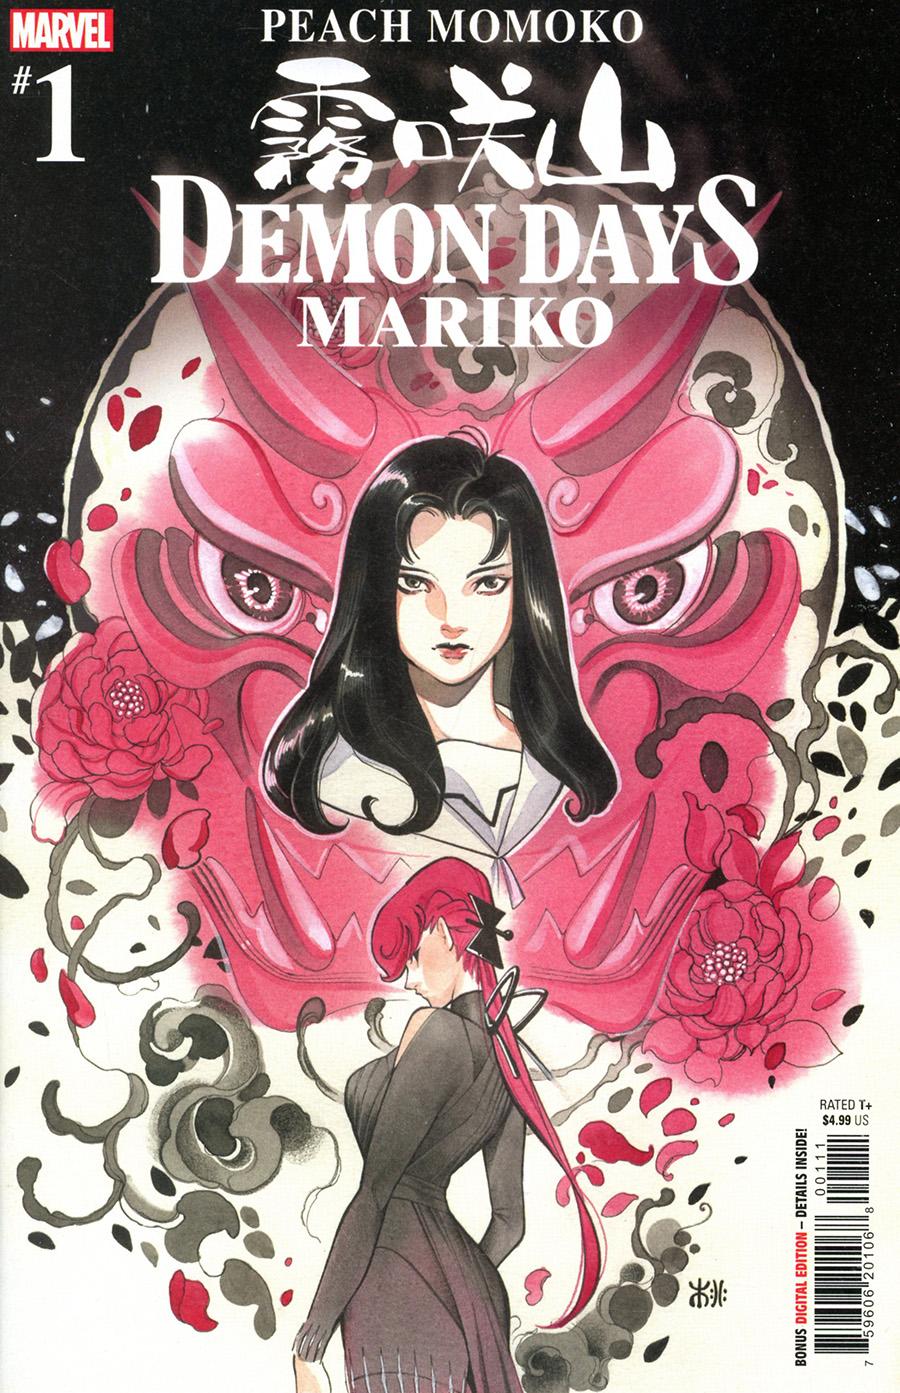 Demon Days Mariko #1 (One Shot) Cover A Regular Peach Momoko Cover